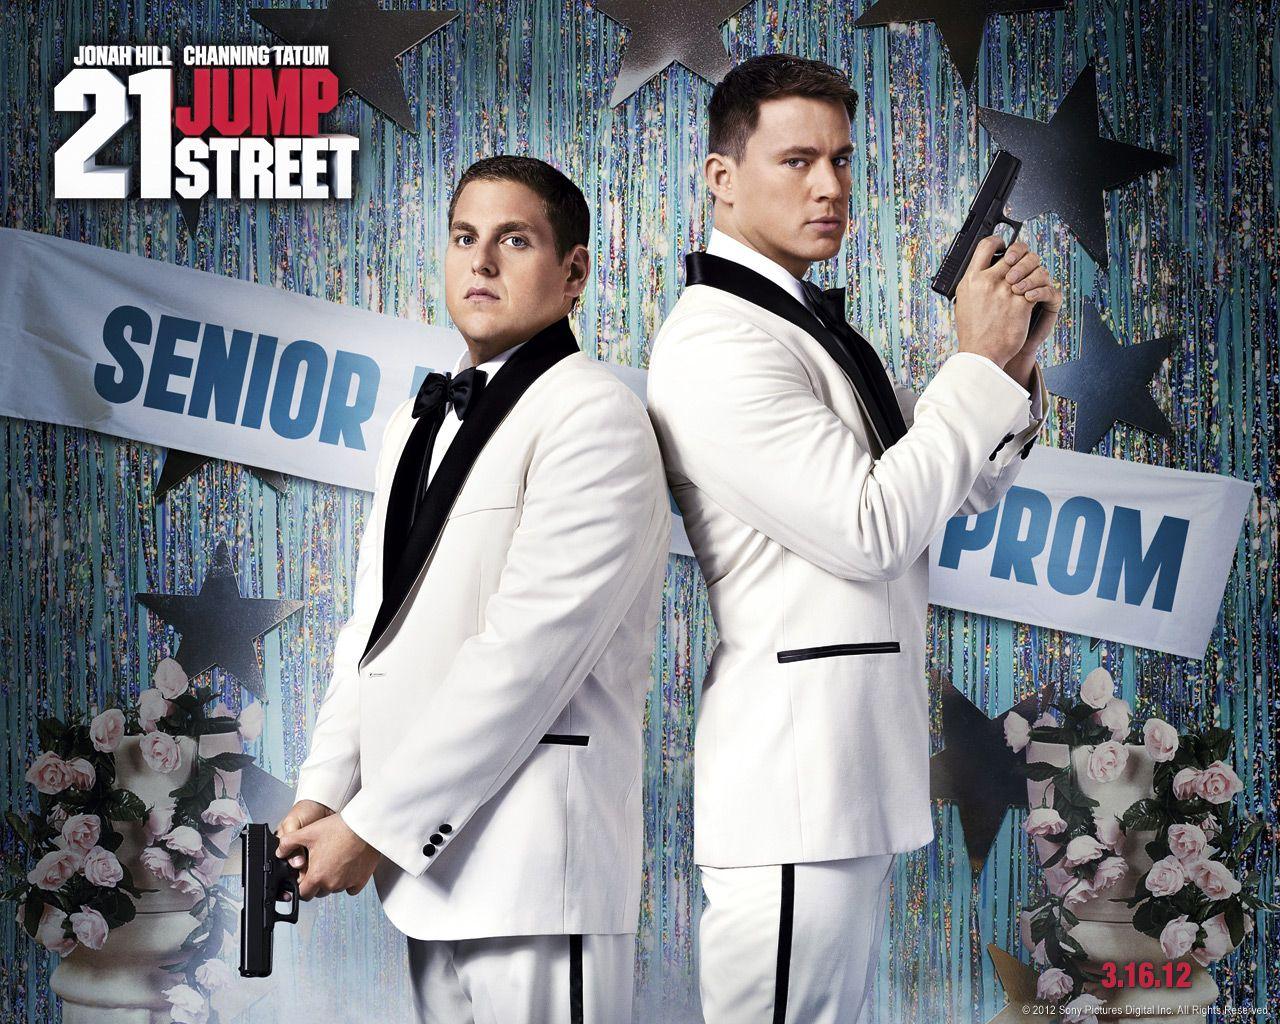 21 jump street movie in hindi free download